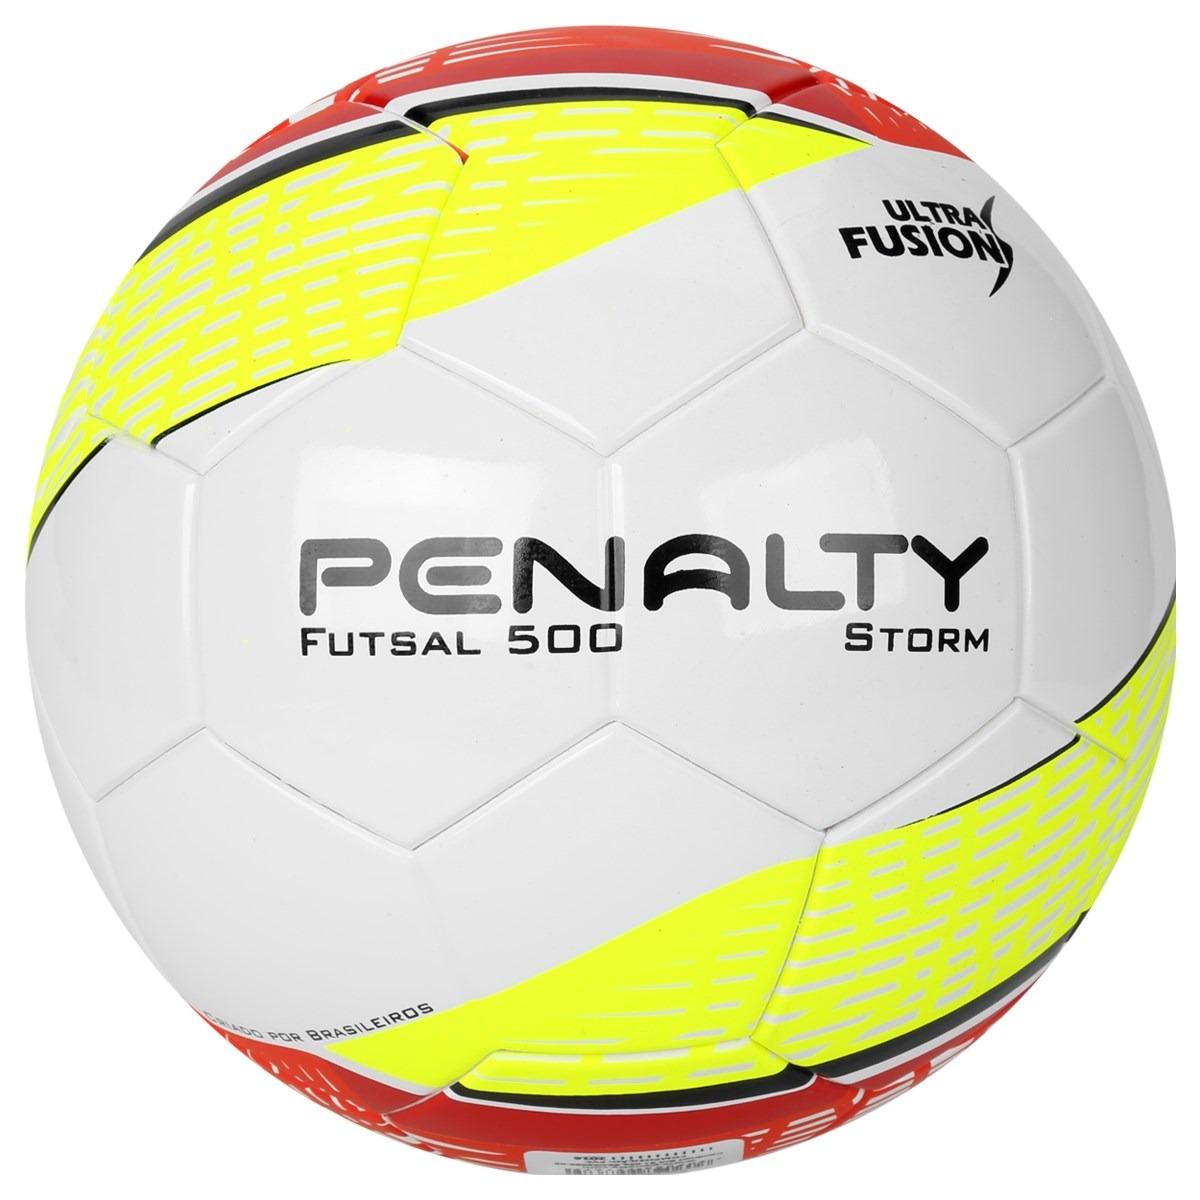 d4b898c44c bola salão futsal penalty storm ultrafusion. Carregando zoom.